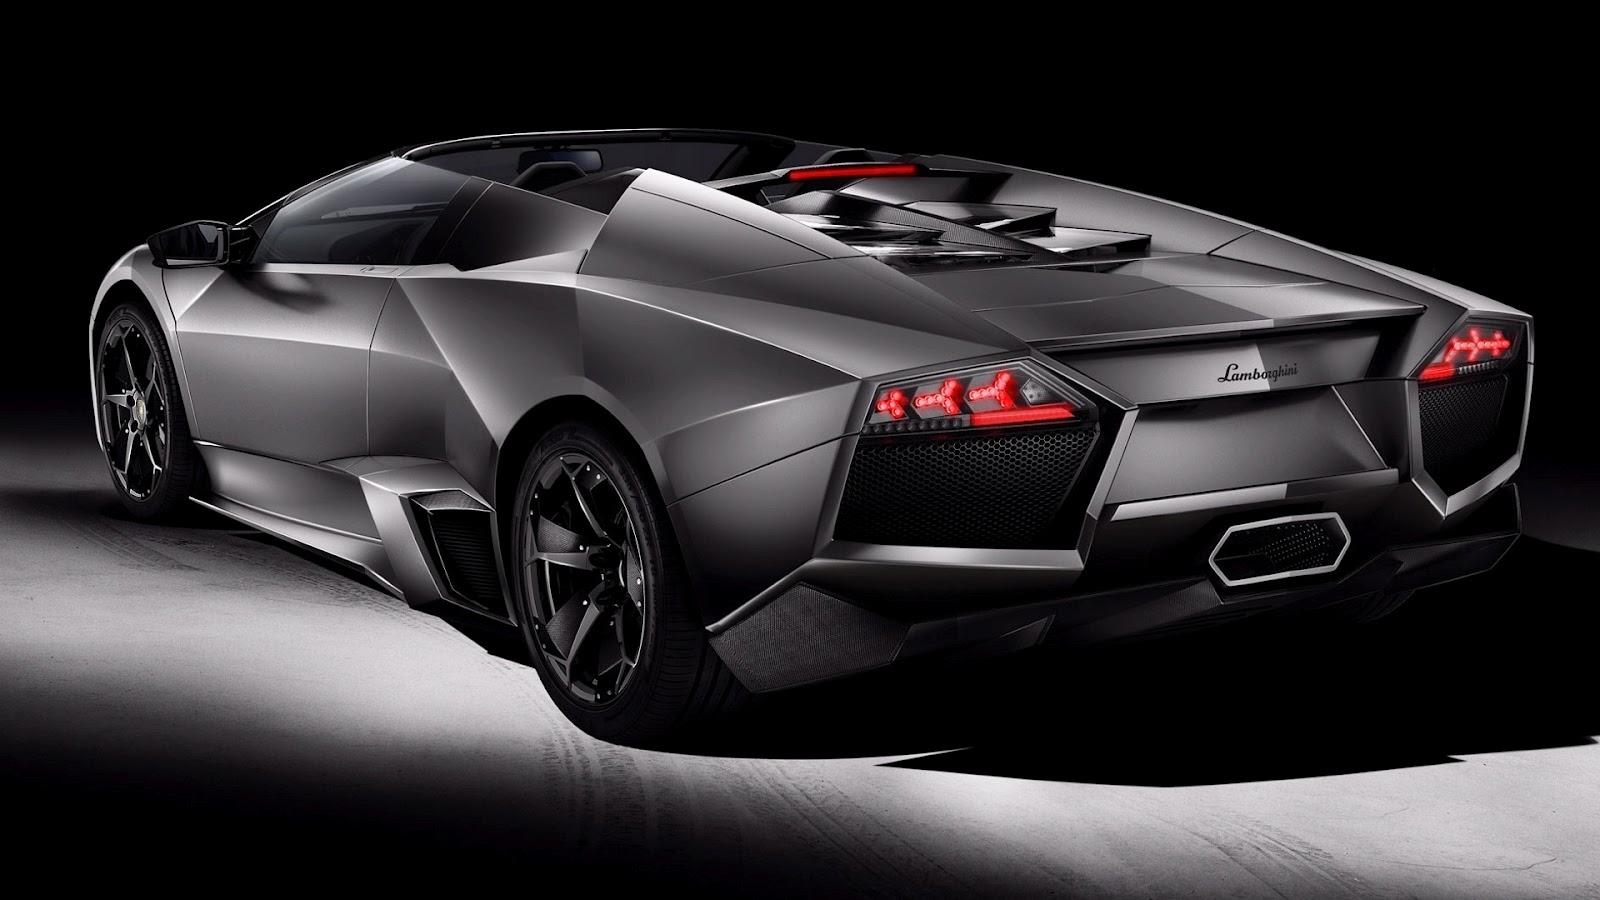 Lamborghini Car Wallpapers Hd Nature Wallpaper